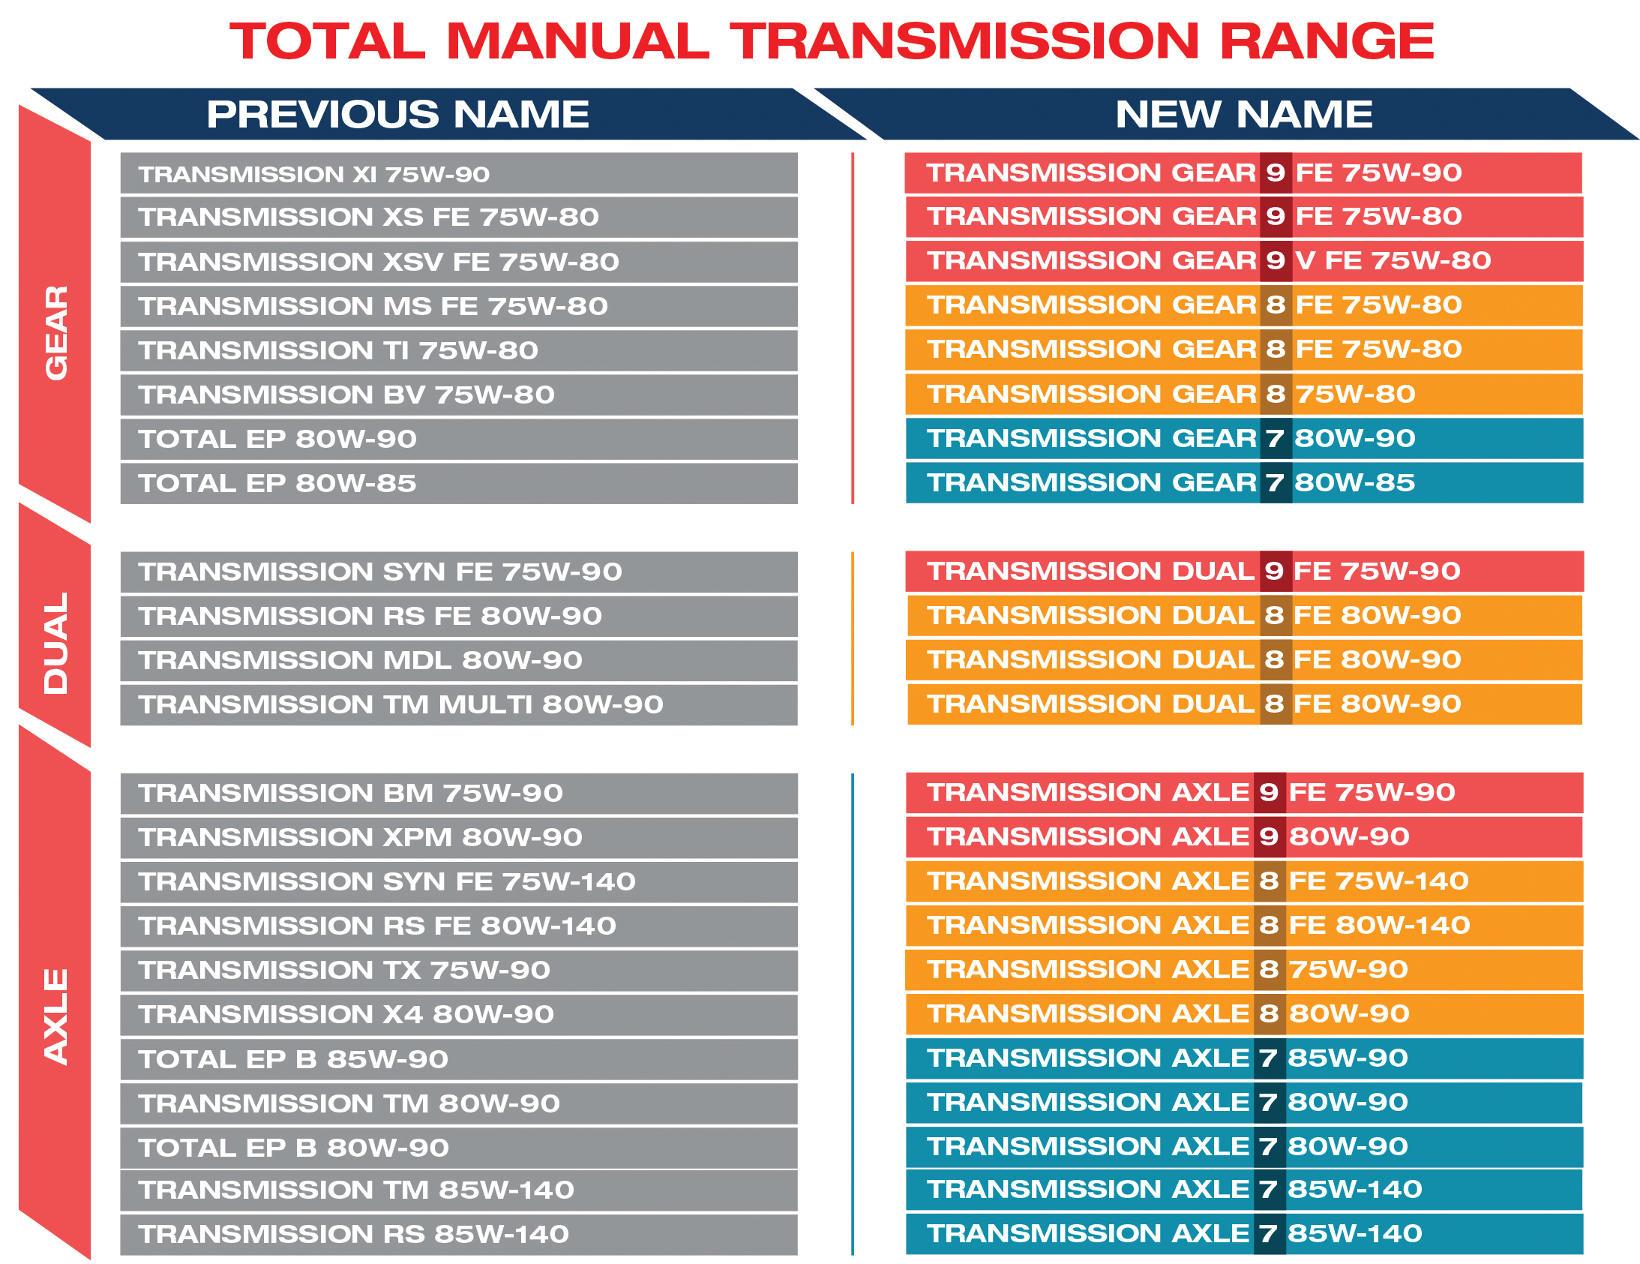 Total Manual Transmission Range